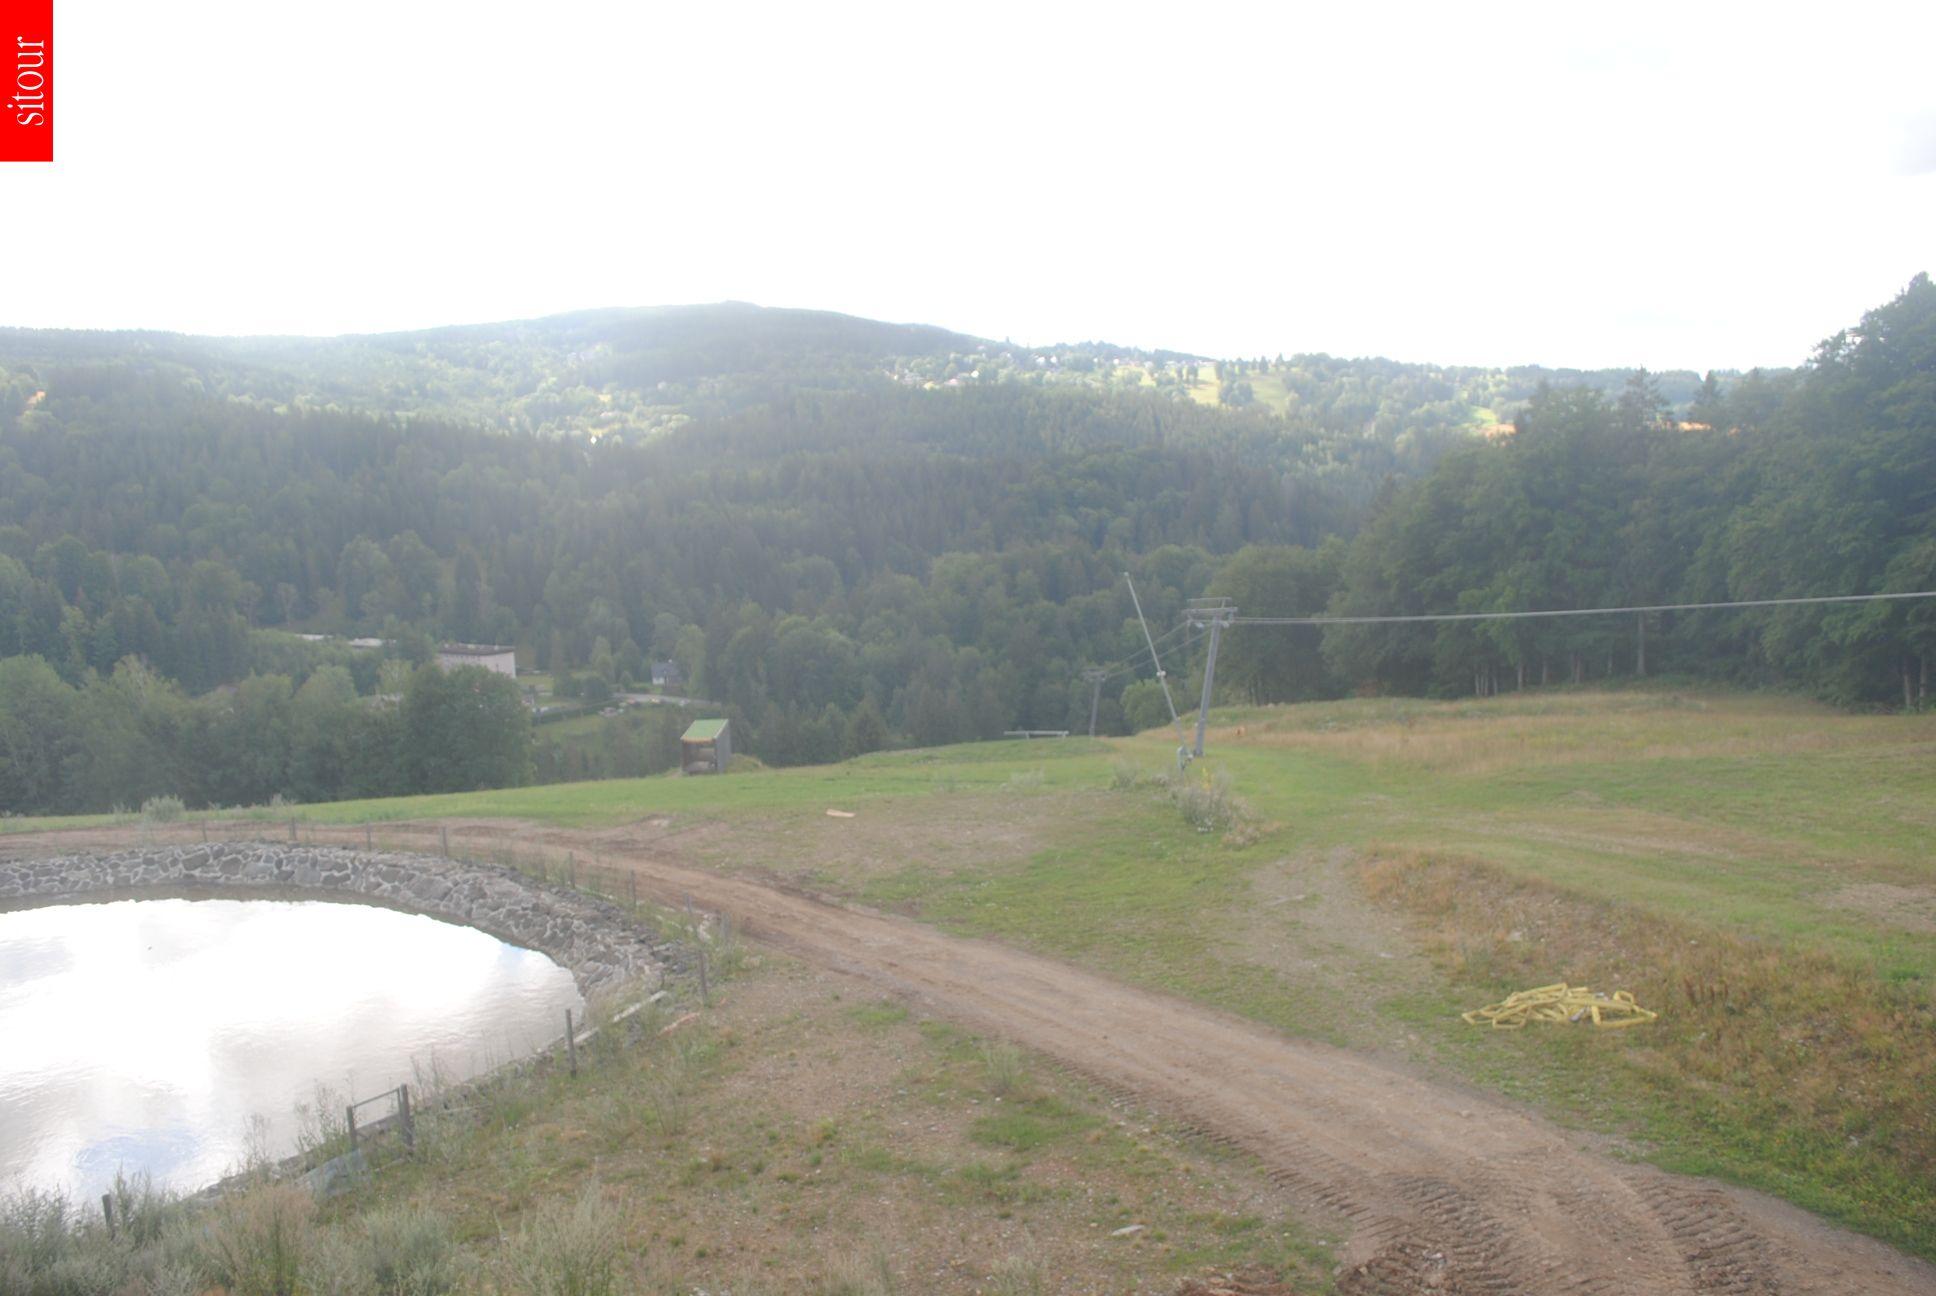 Webcam Ski Resort Vitkovice cam 3 - Giant Mountains